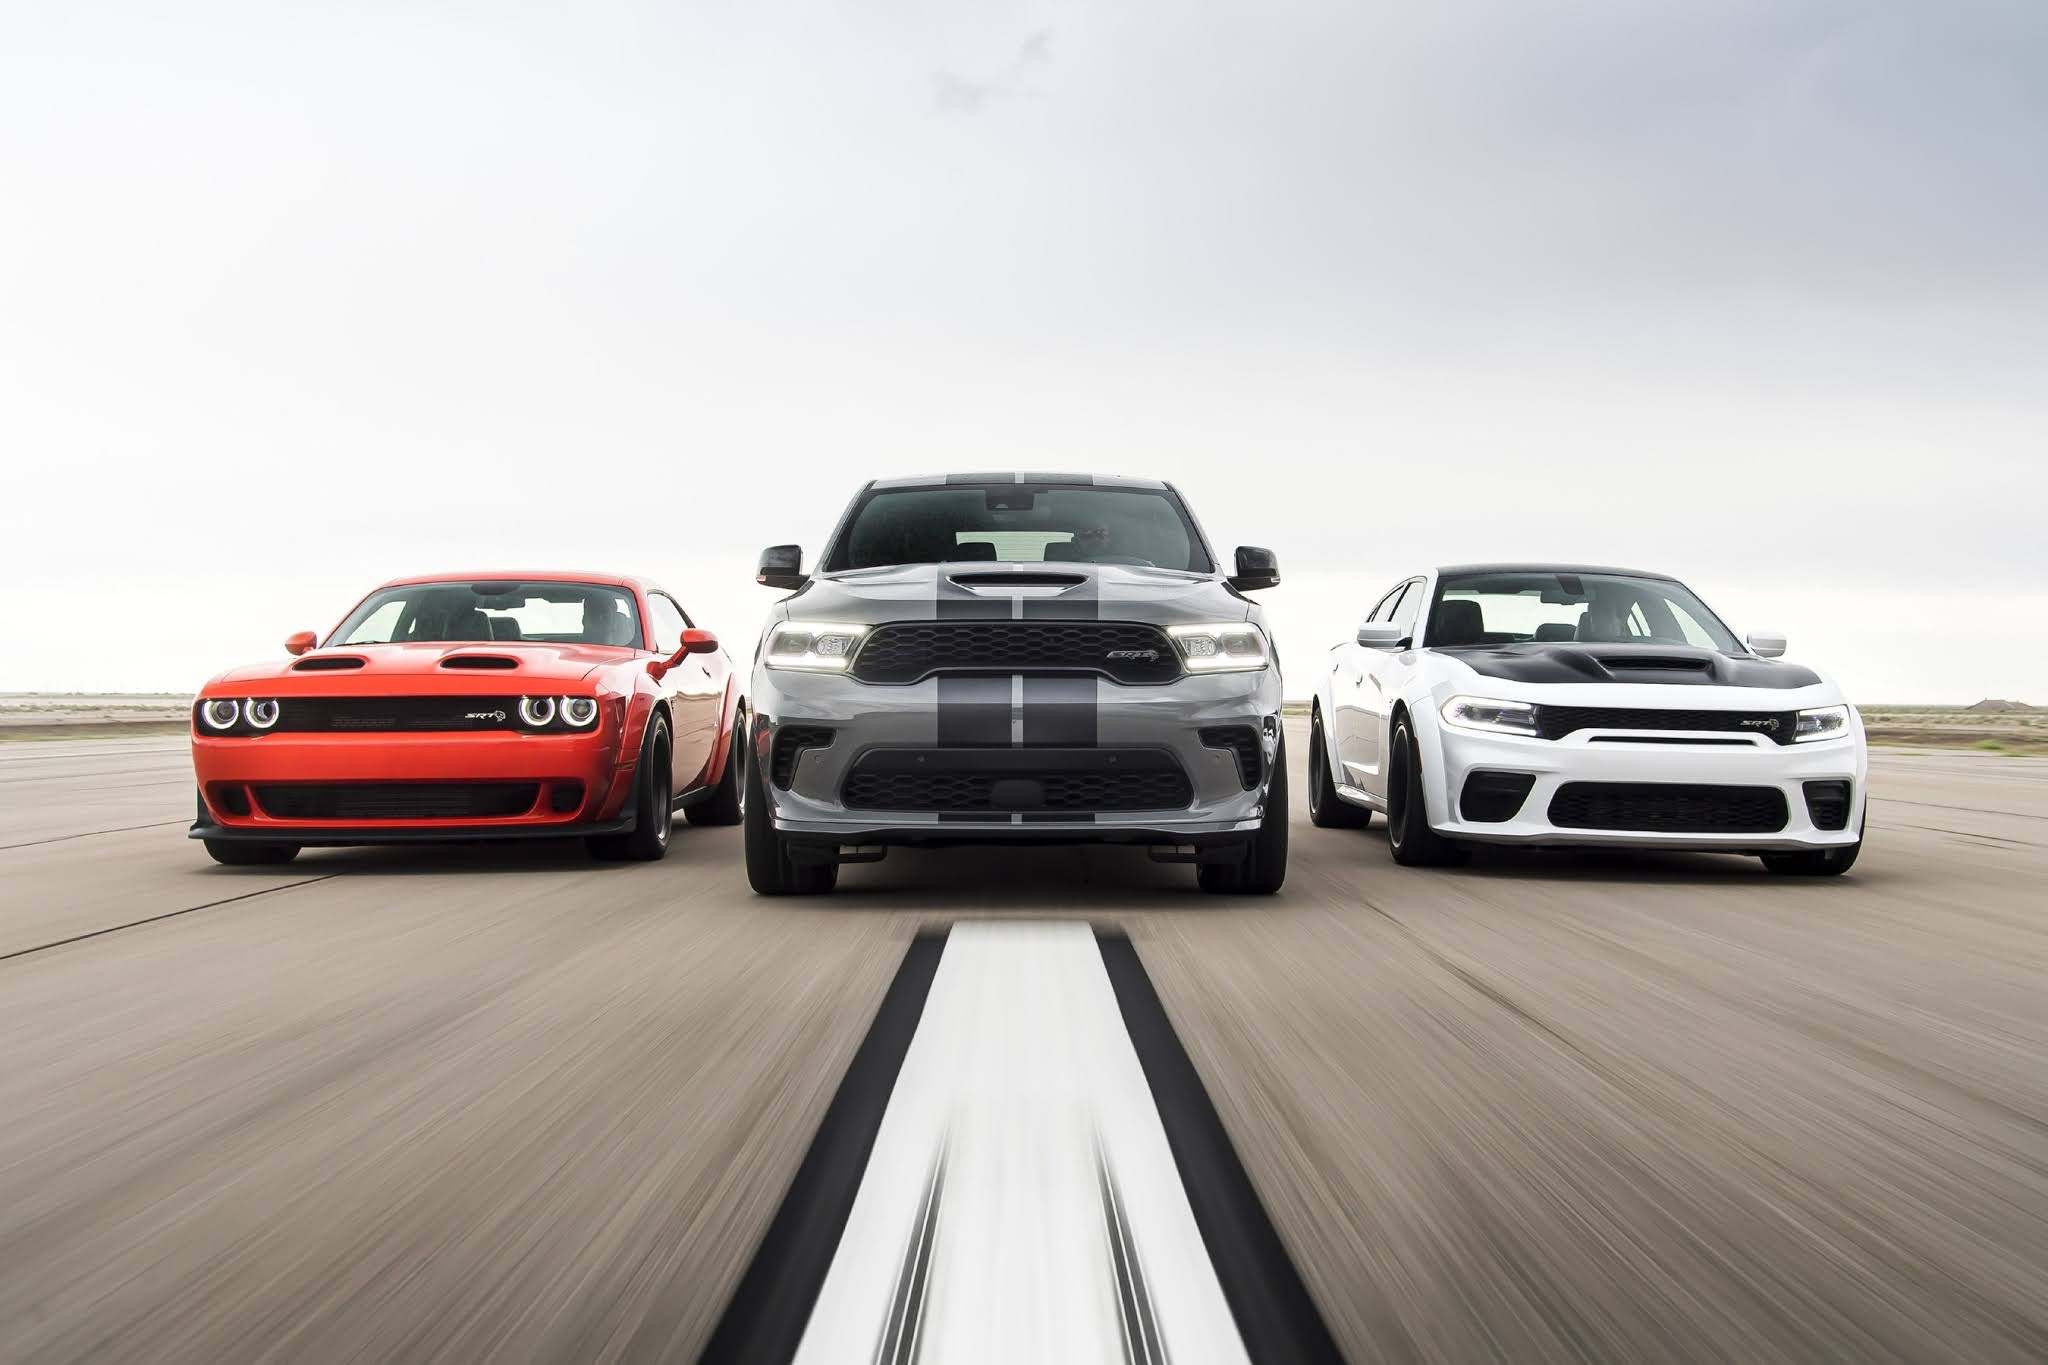 New 2021 Dodge Durango SRT Hellcat Production Starts